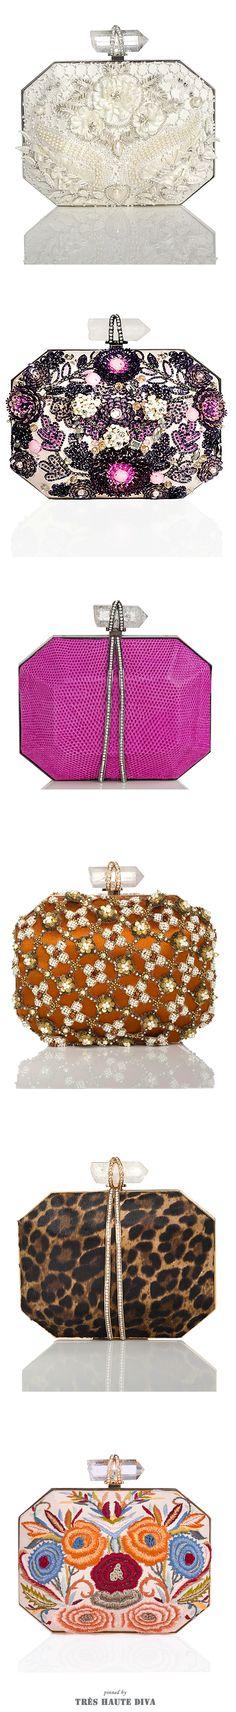 ♕ Marchesa ♔   2014-15 Carteras de forma poligonal con detalles florales de lentejuelas de colores.♥♥